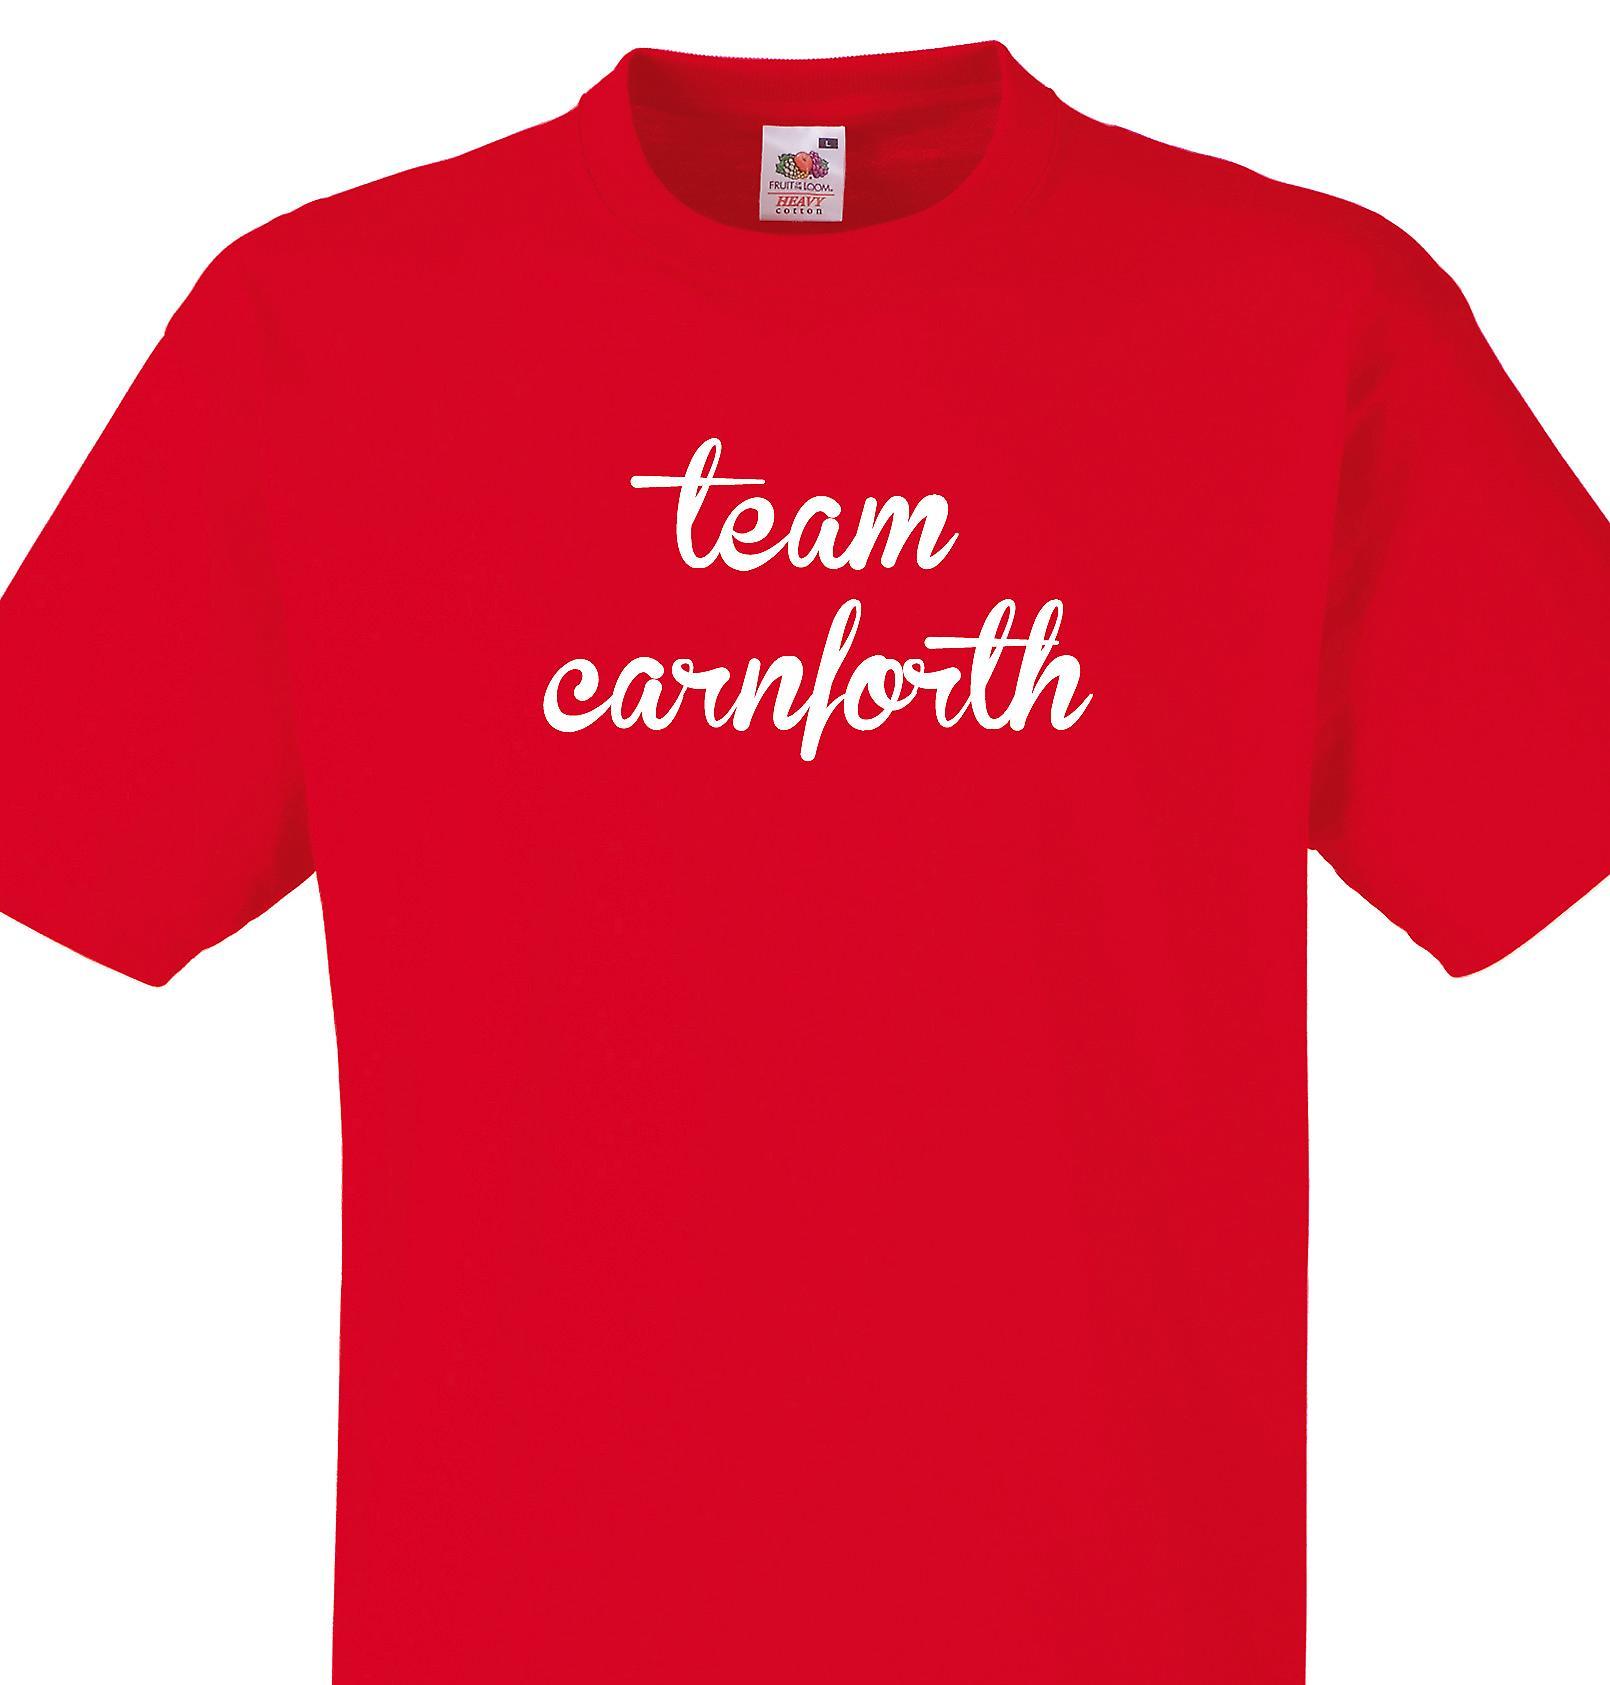 Team Carnforth Red T shirt